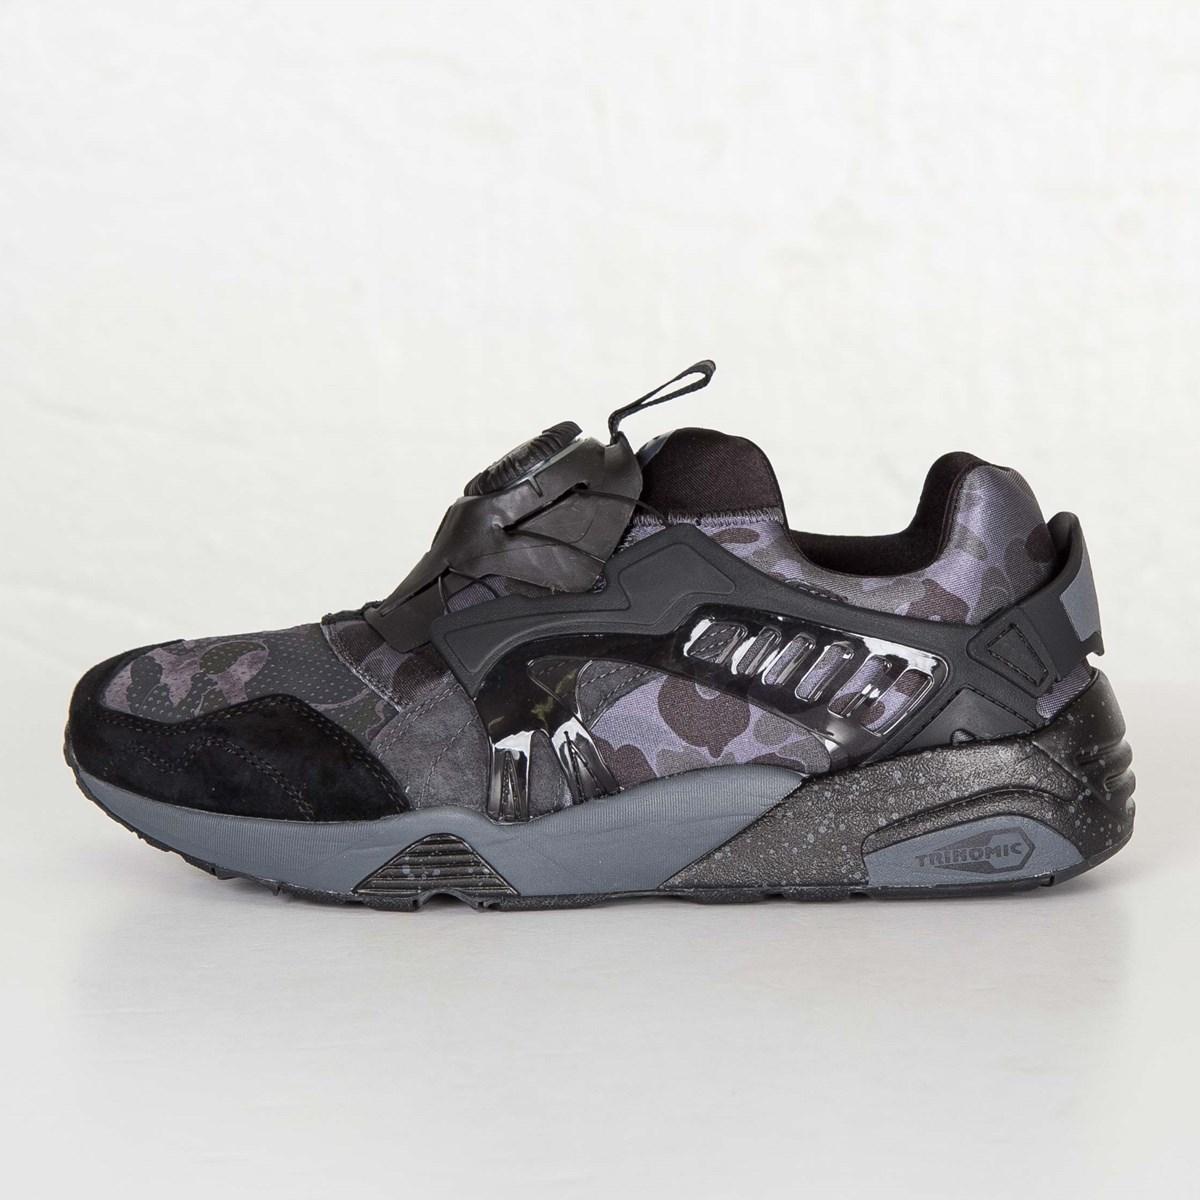 f44229c6810 Puma Disc Blaze x Bape - 358846-02 - Sneakersnstuff